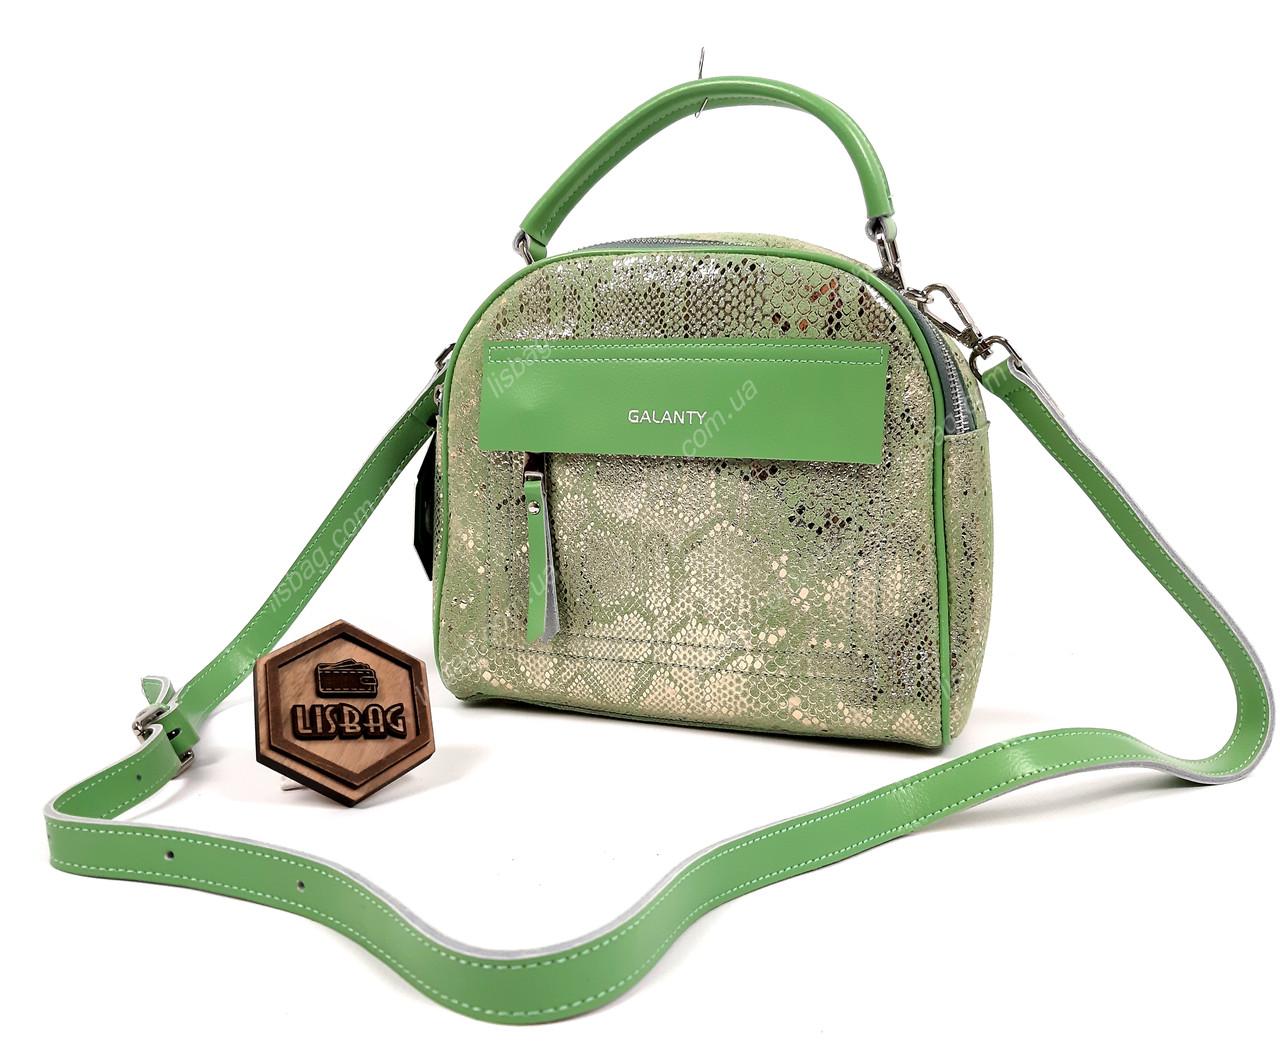 fbbd37def5e3 Женская кожаная сумка с Лазерного замша Зеленая: продажа, цена в ...